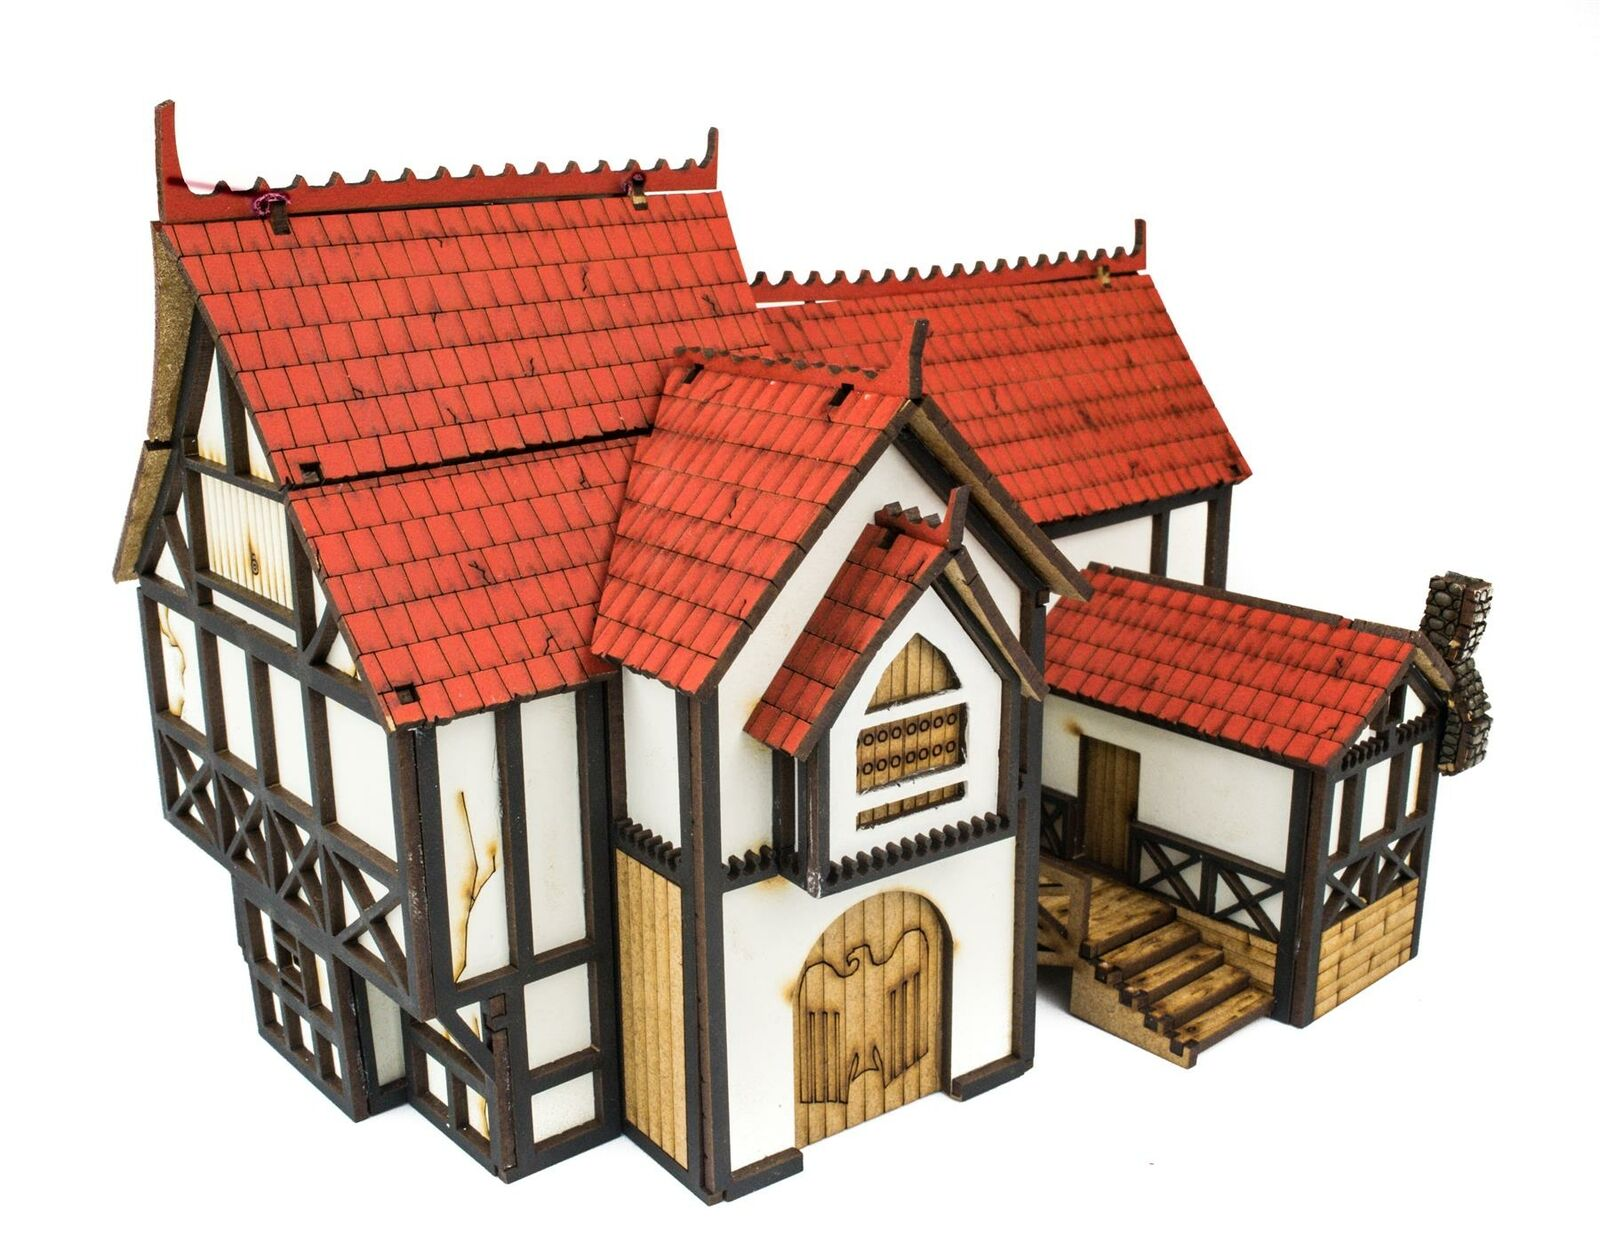 WWG Medieval Town – Mablack (Peint Non peint) 28mm – Wargaming, Figurines